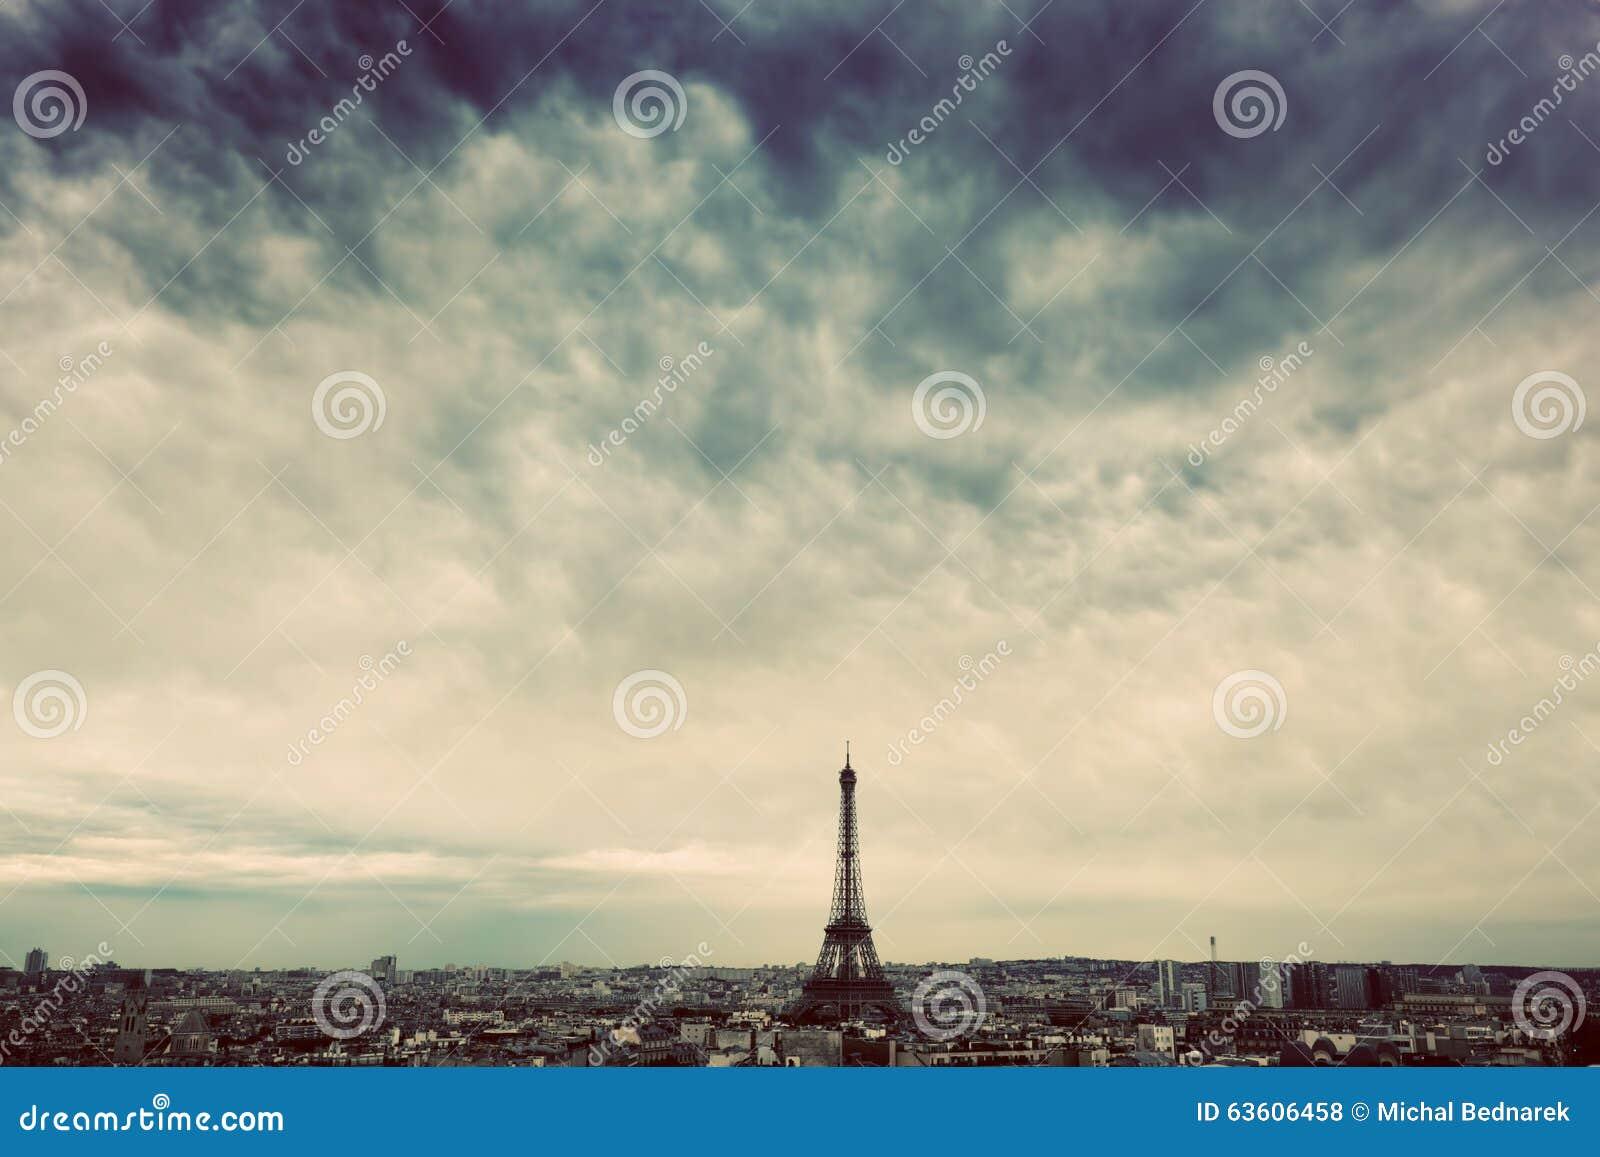 Paris, France skyline with Eiffel Tower. Dark clouds